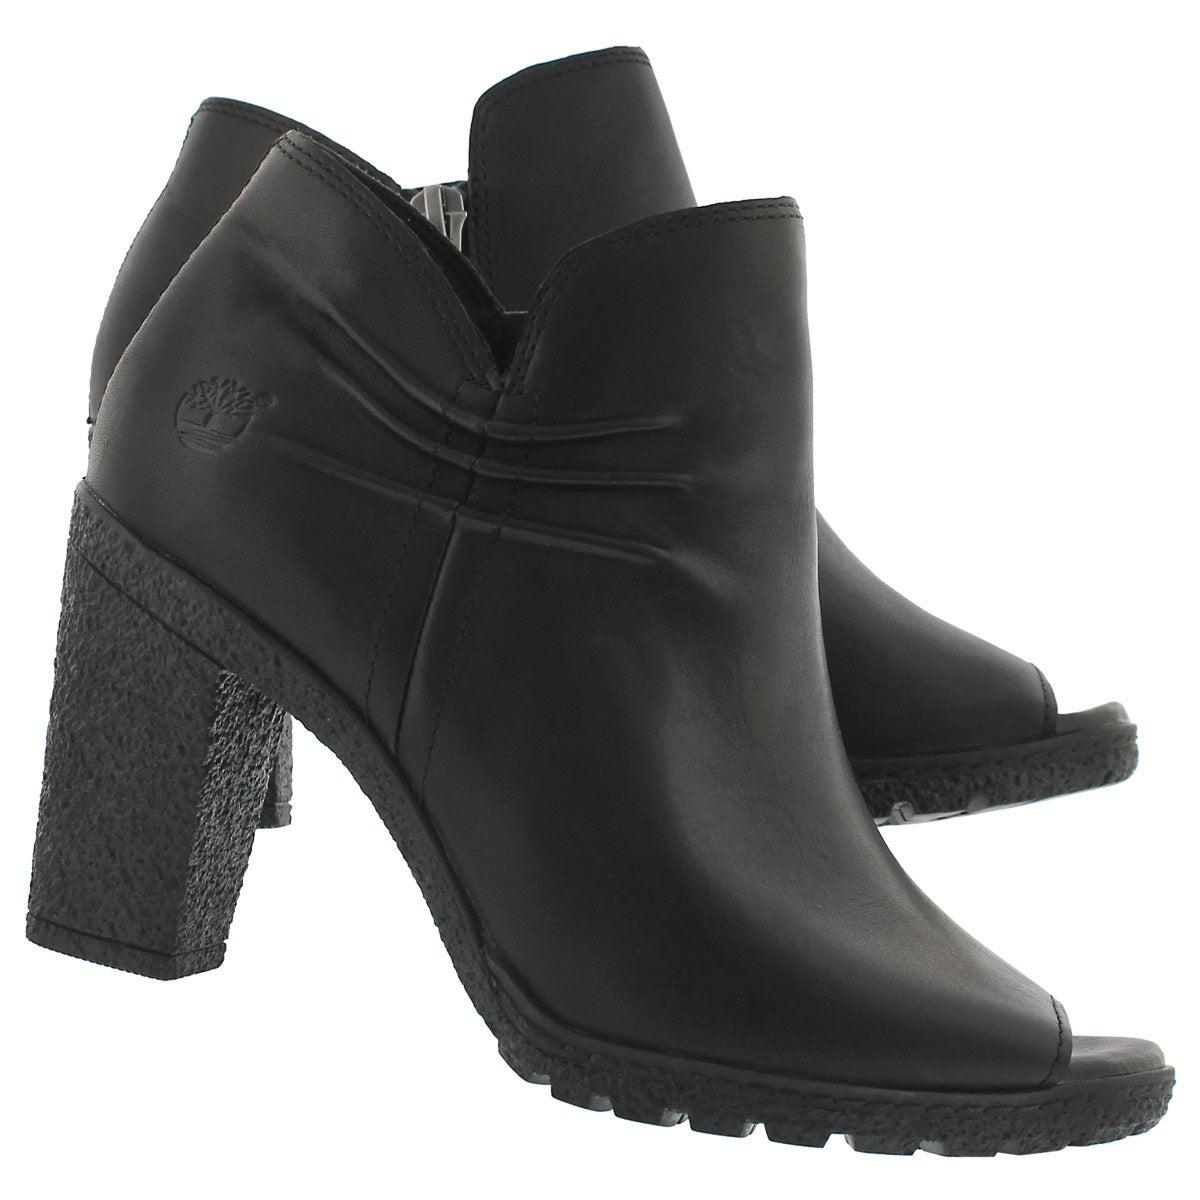 Lds Glancy black peep toe dress heel